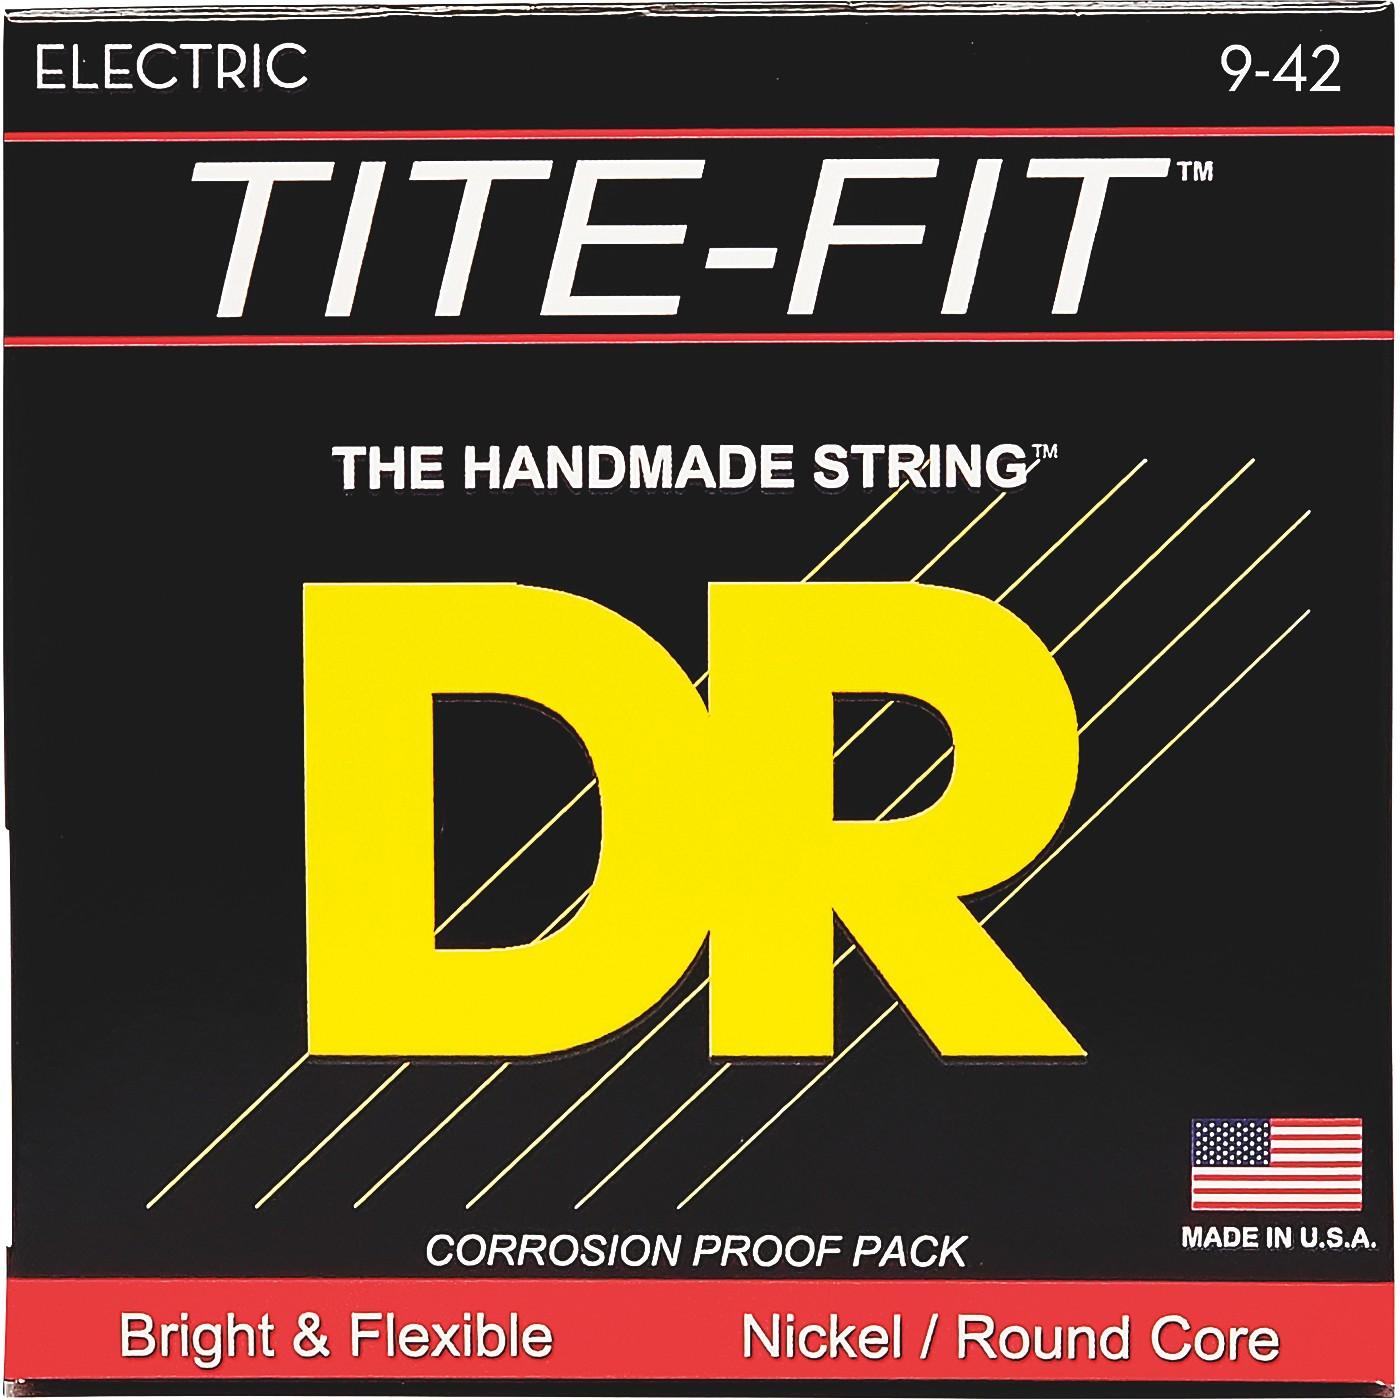 DR Strings Tite-Fit LT-9 Lite-n-Tite Nickel Plated Electric Guitar Strings thumbnail